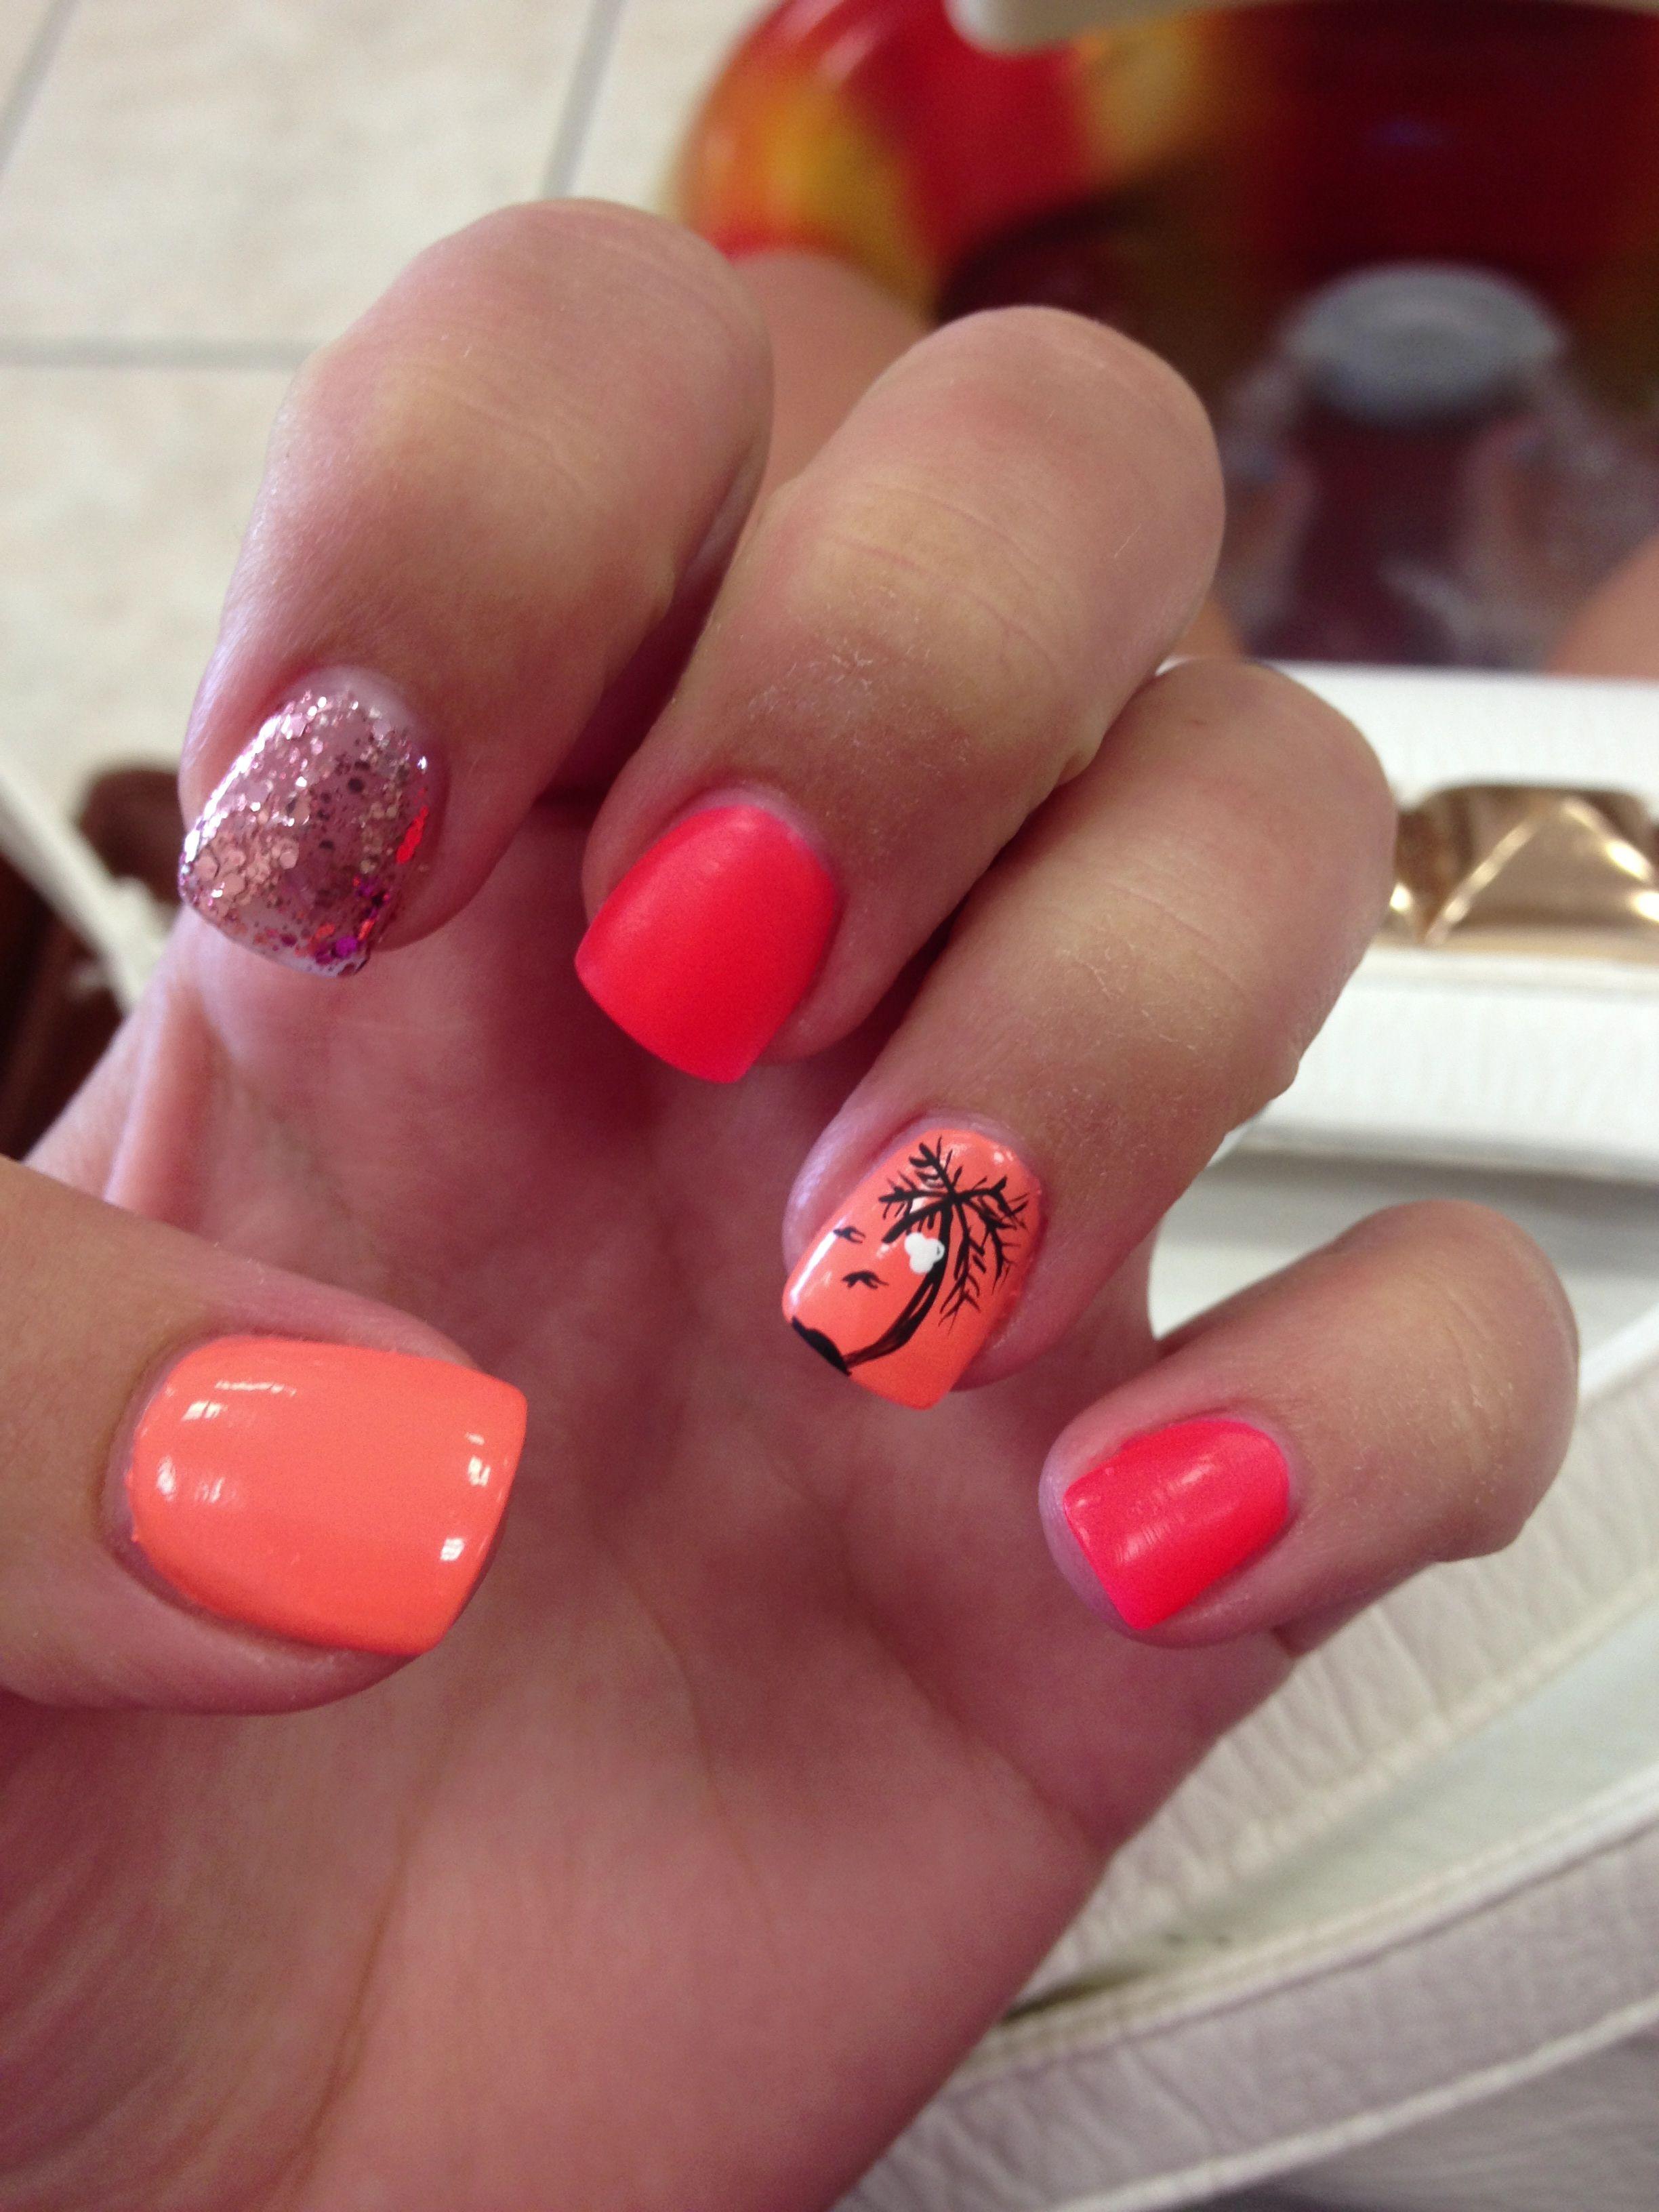 Vacation nails! | Beauty | Pinterest